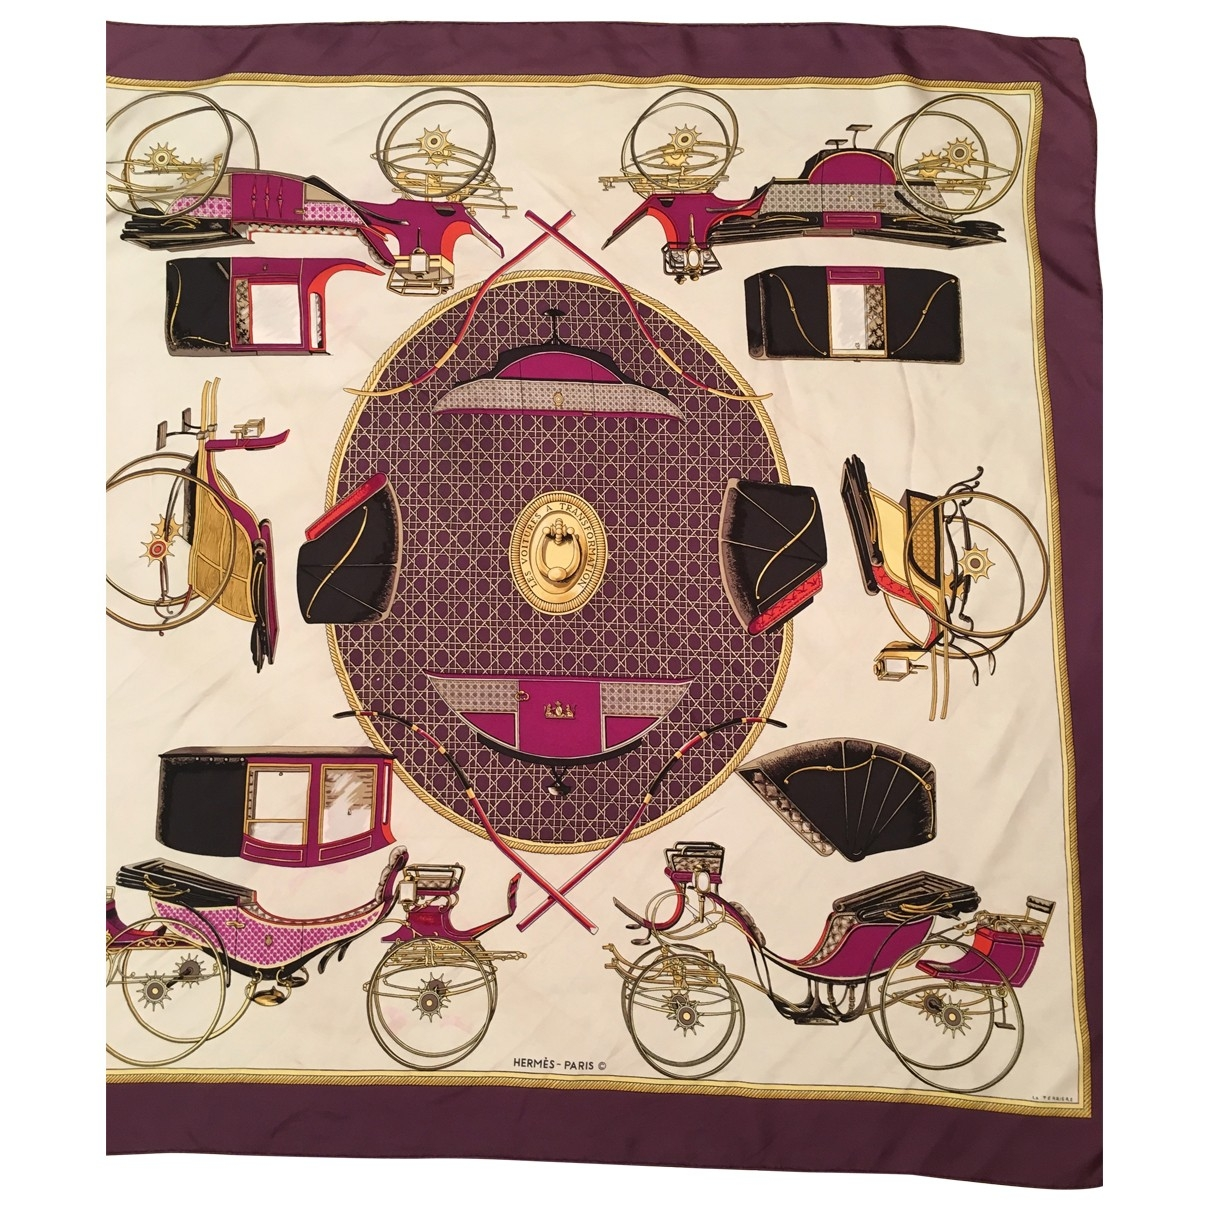 Pañuelo Carre Geant silk de Seda Hermes